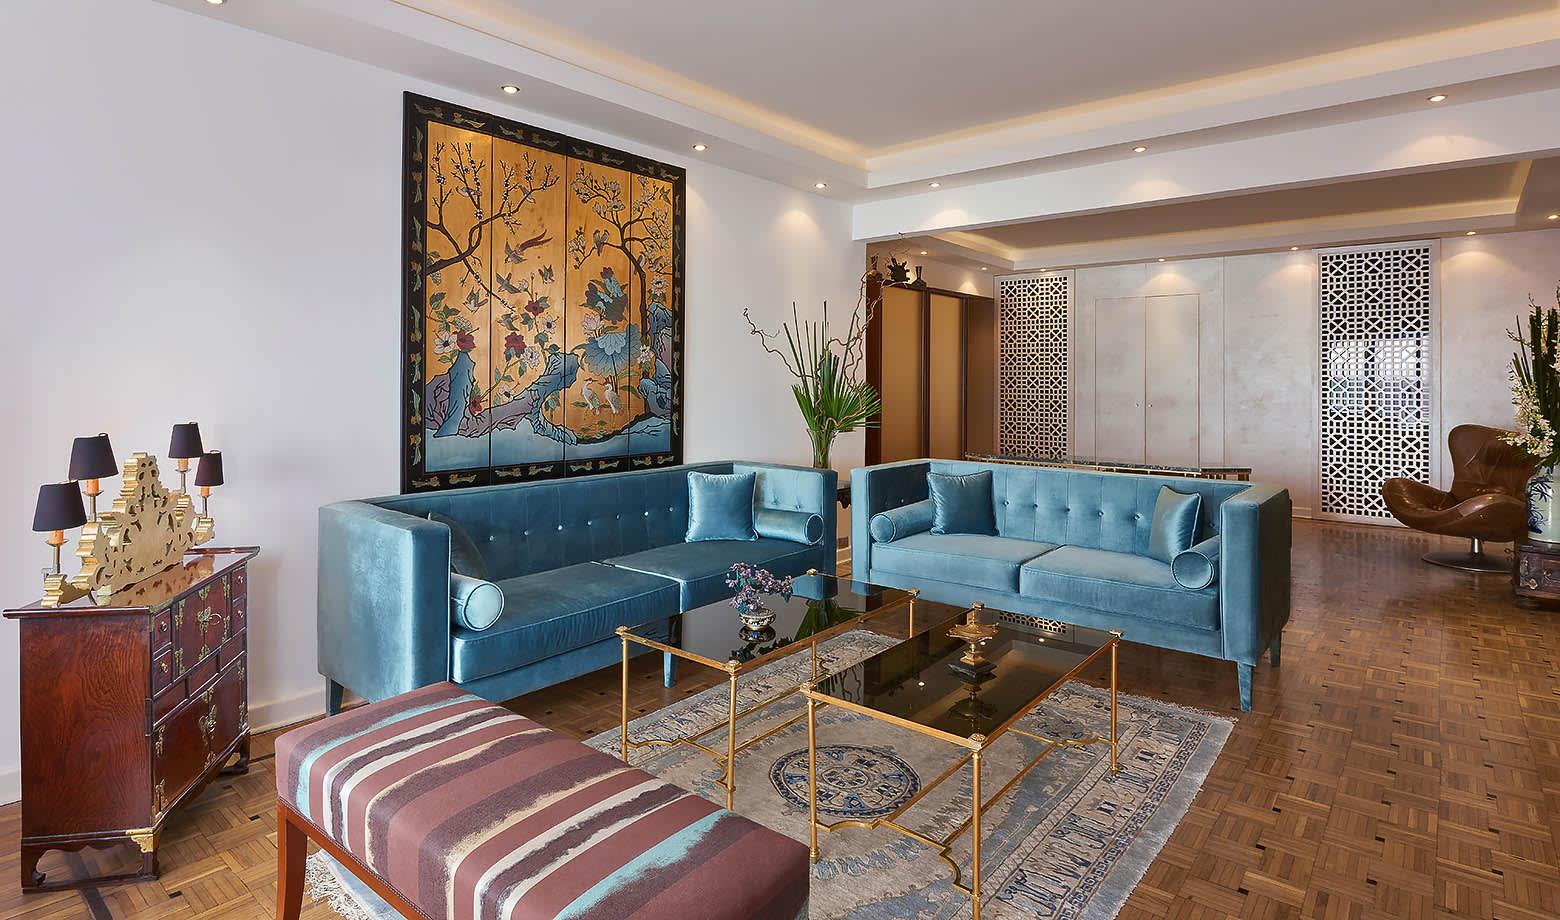 living room- nihal zaki - Mohamed abdel-hady photography